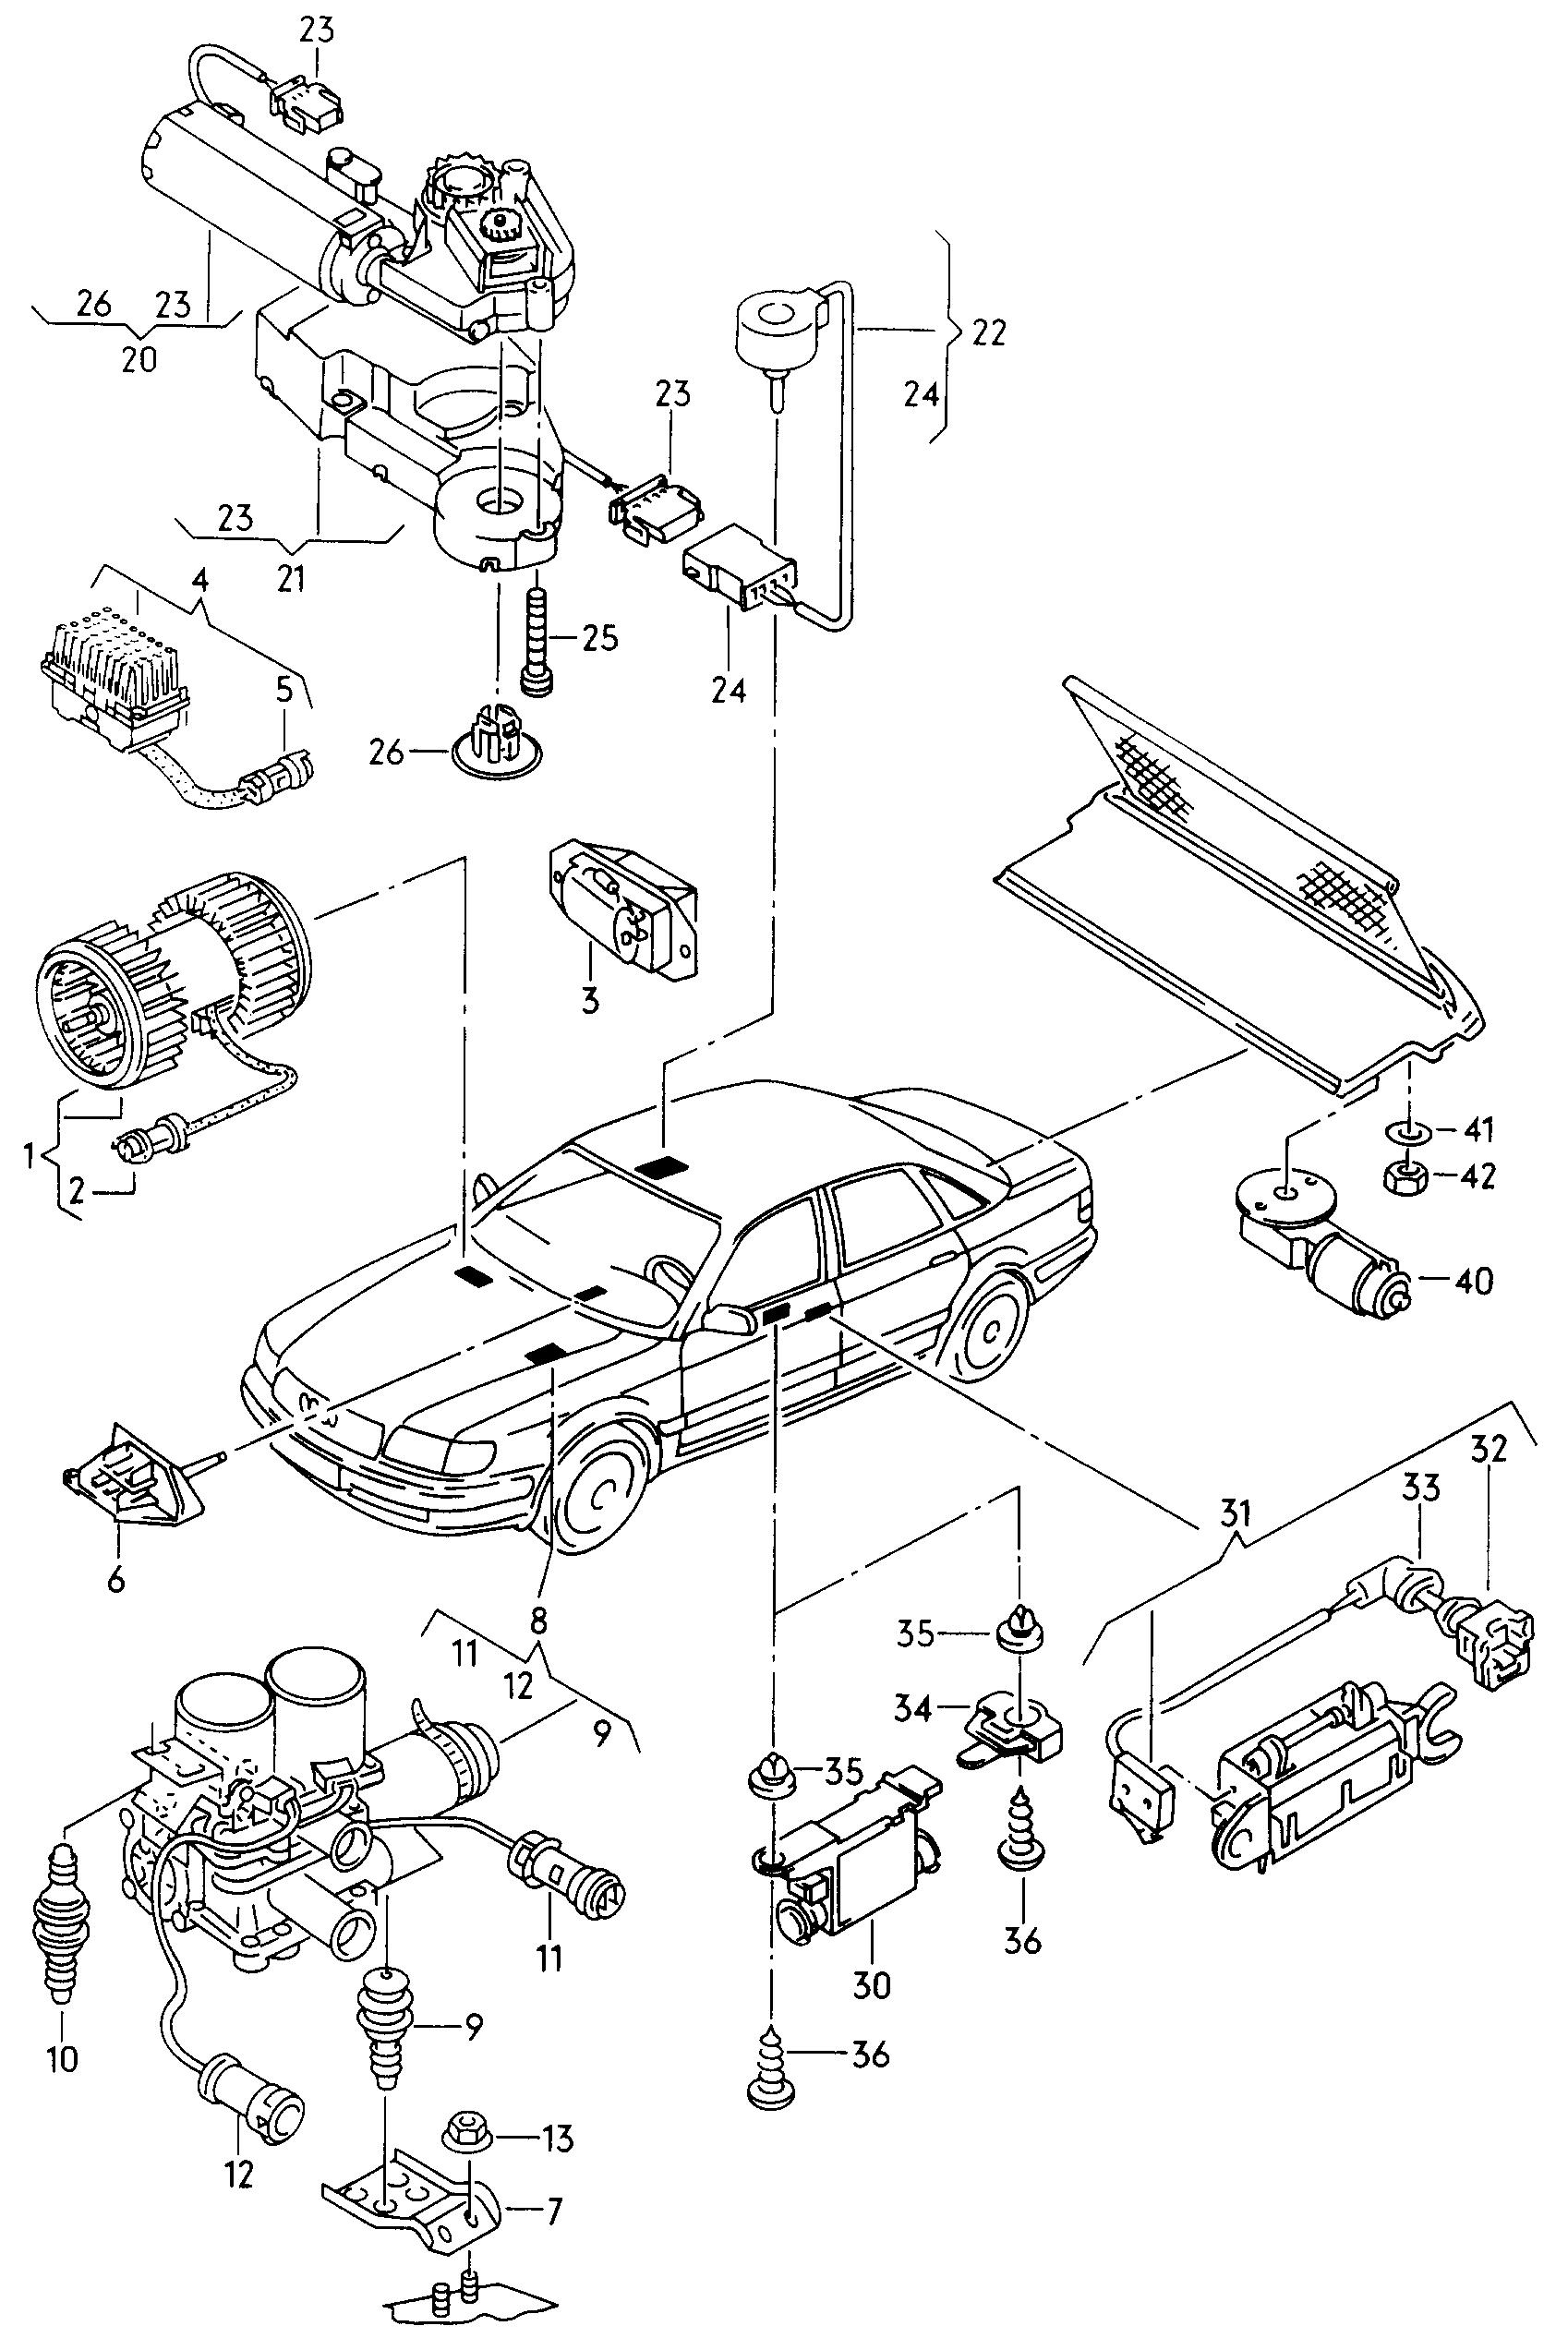 Audi A8 S8 Quattro 1999 2003 Sliding Roof Motor Fan Valve Engine Diagram Vag Etka